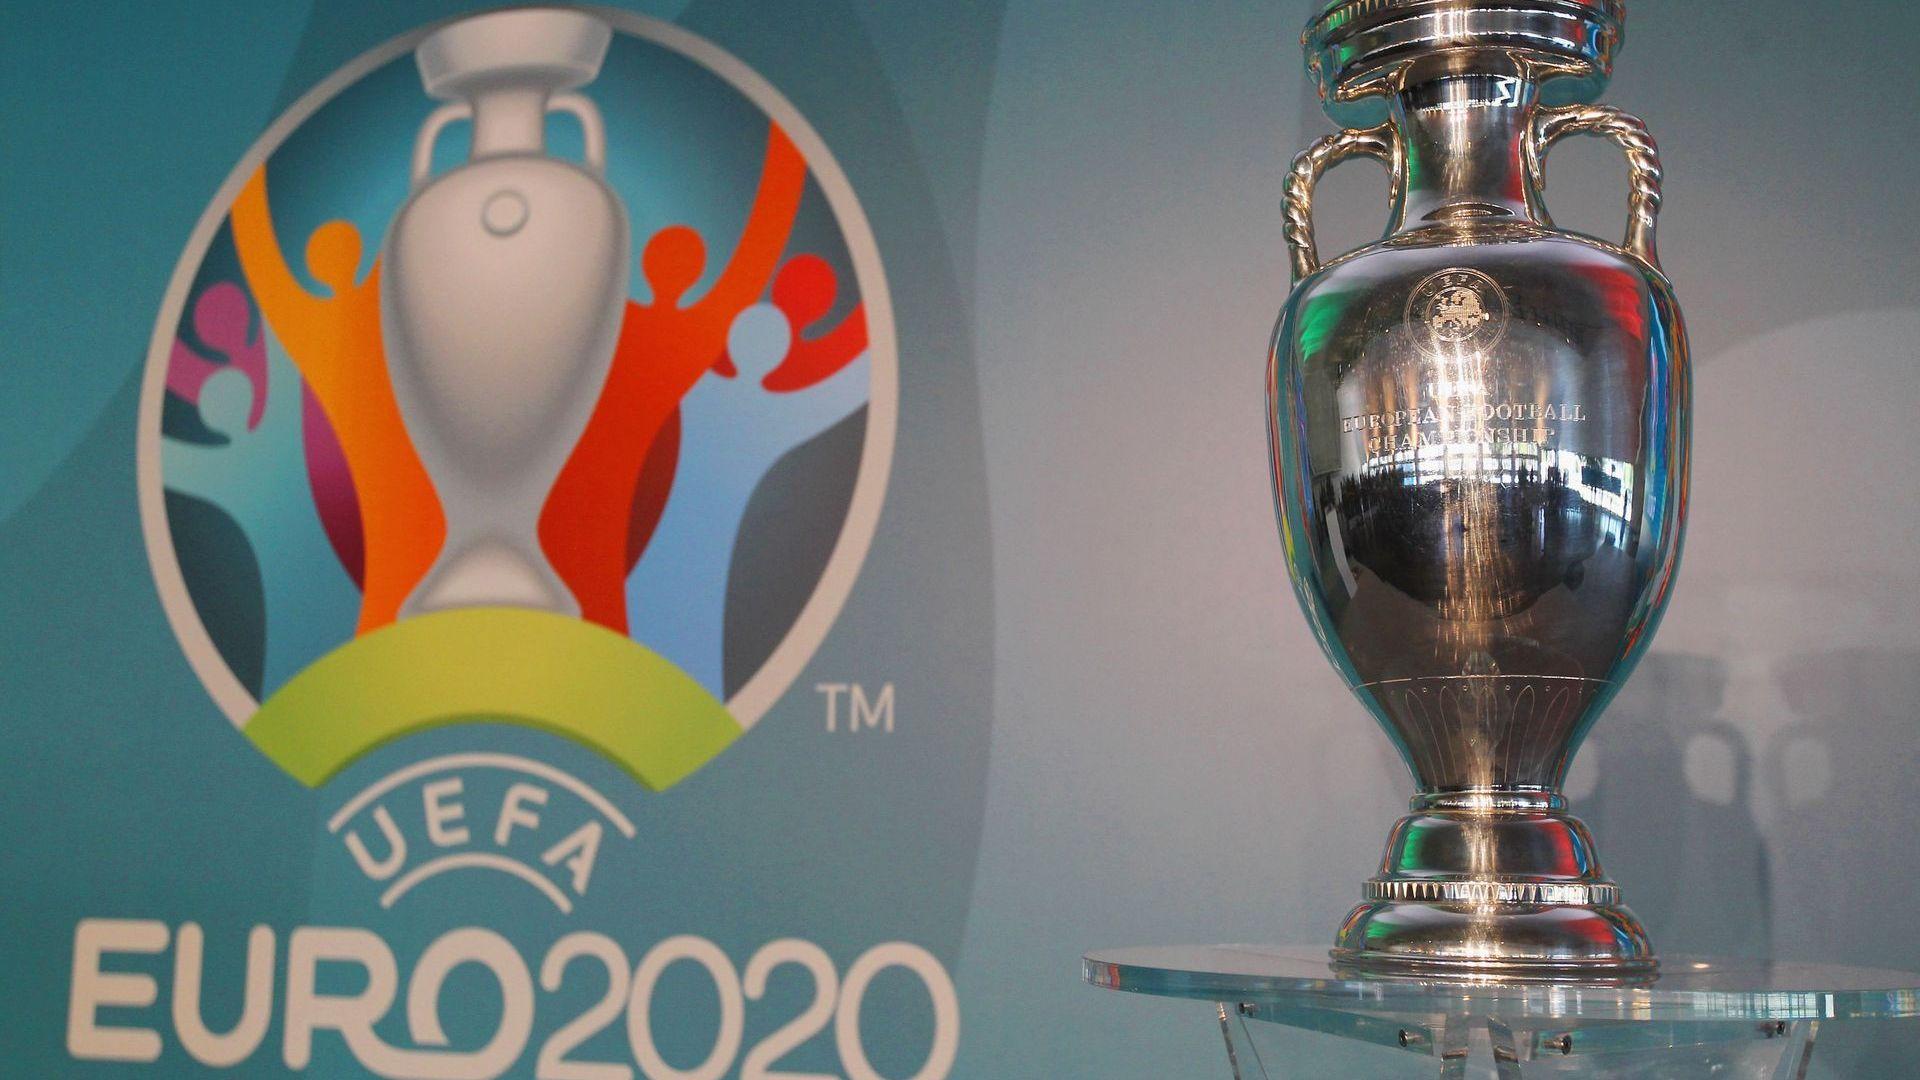 Евро 2020 може да се изиграе през декември